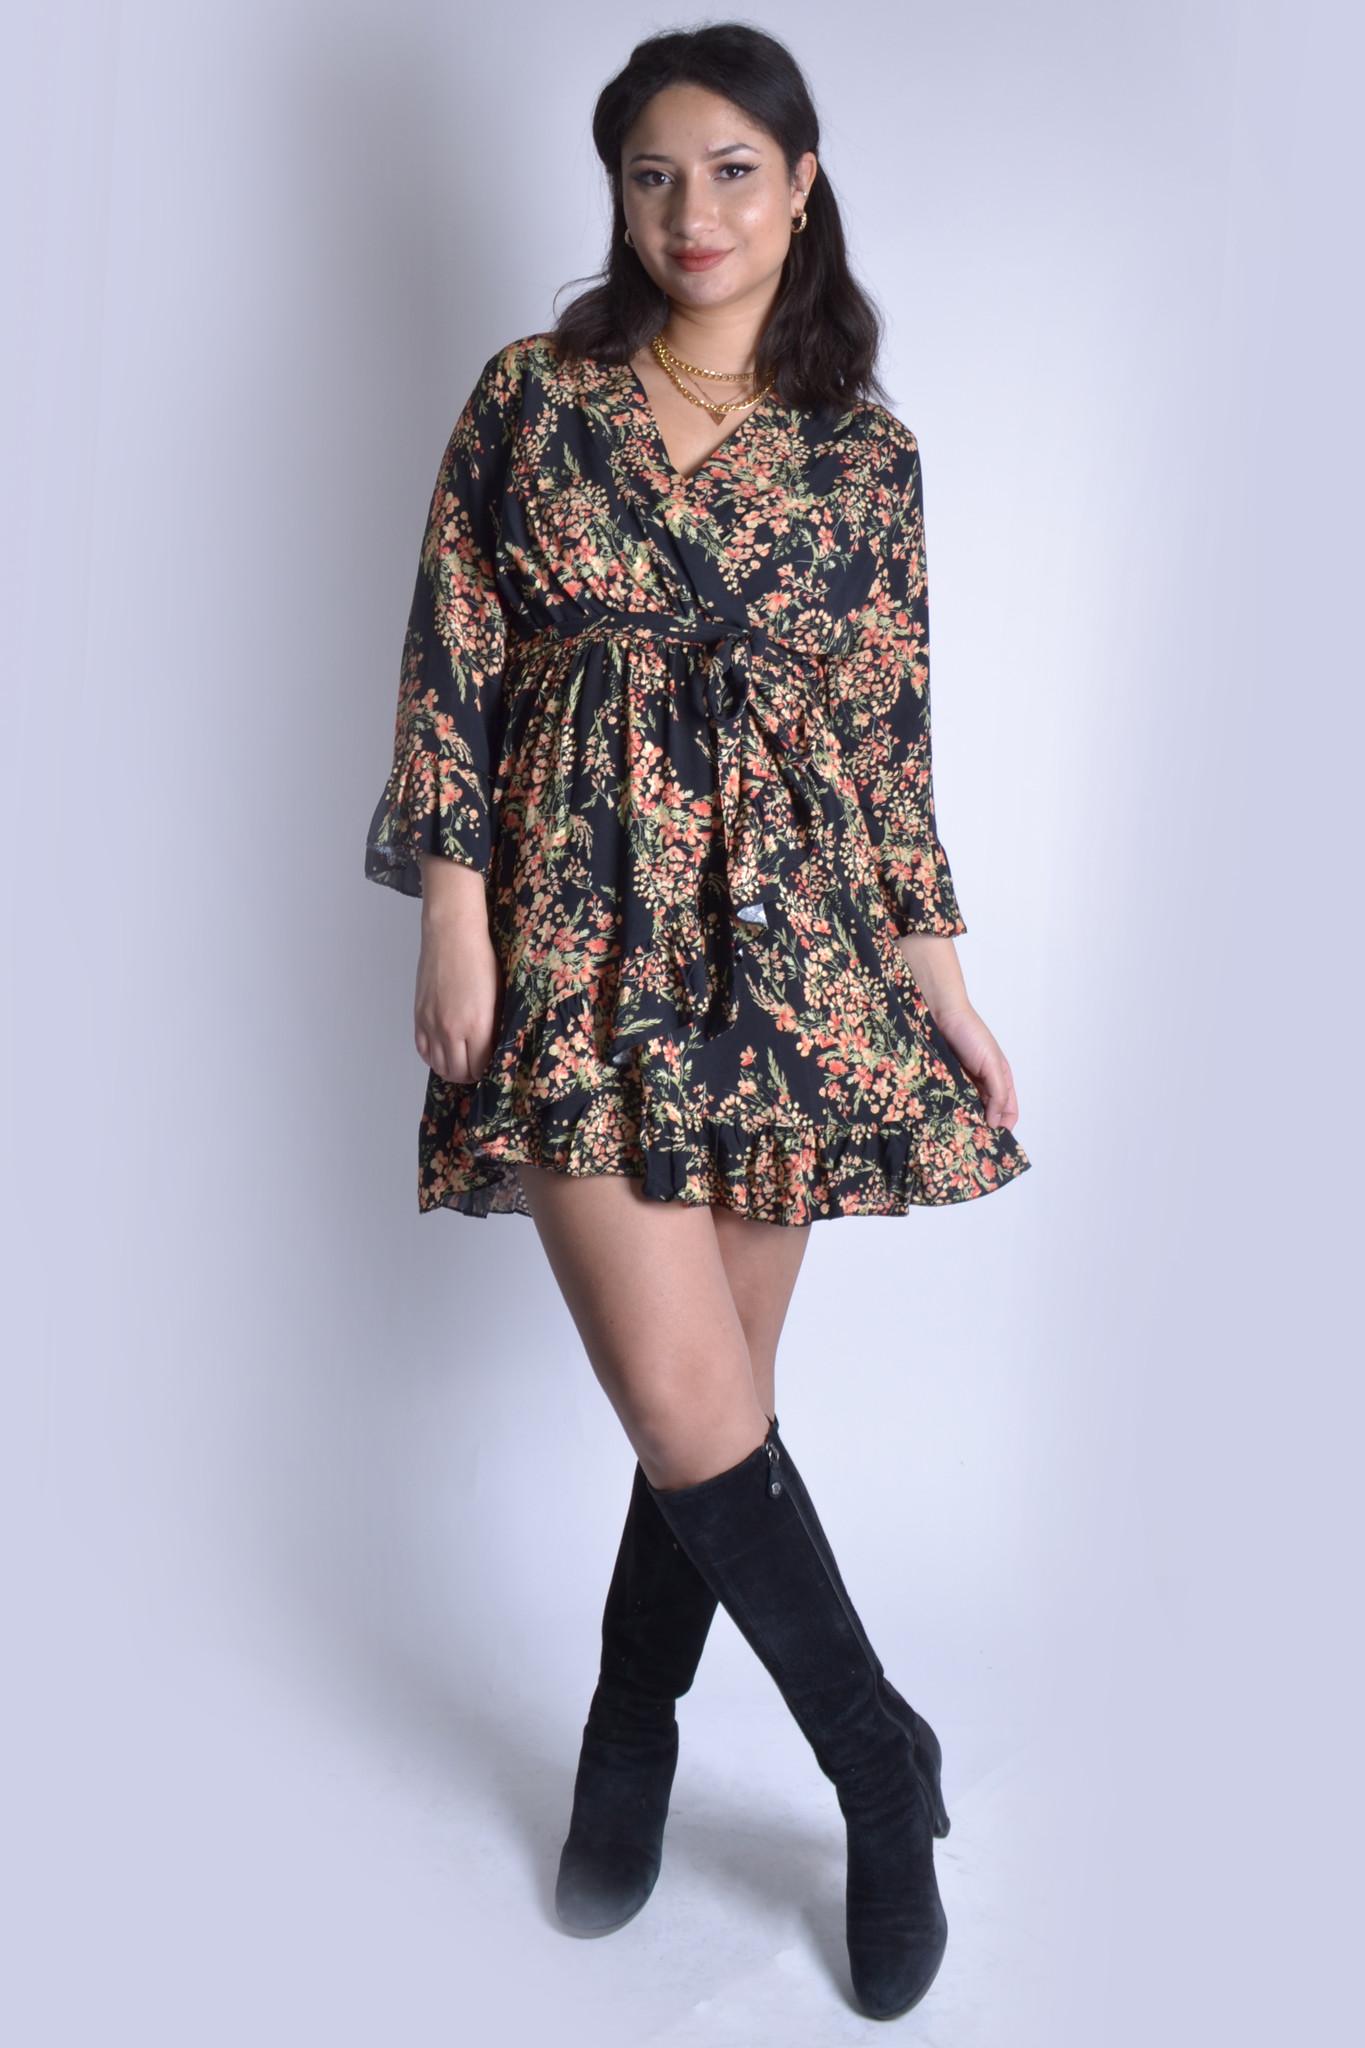 Floral jurk